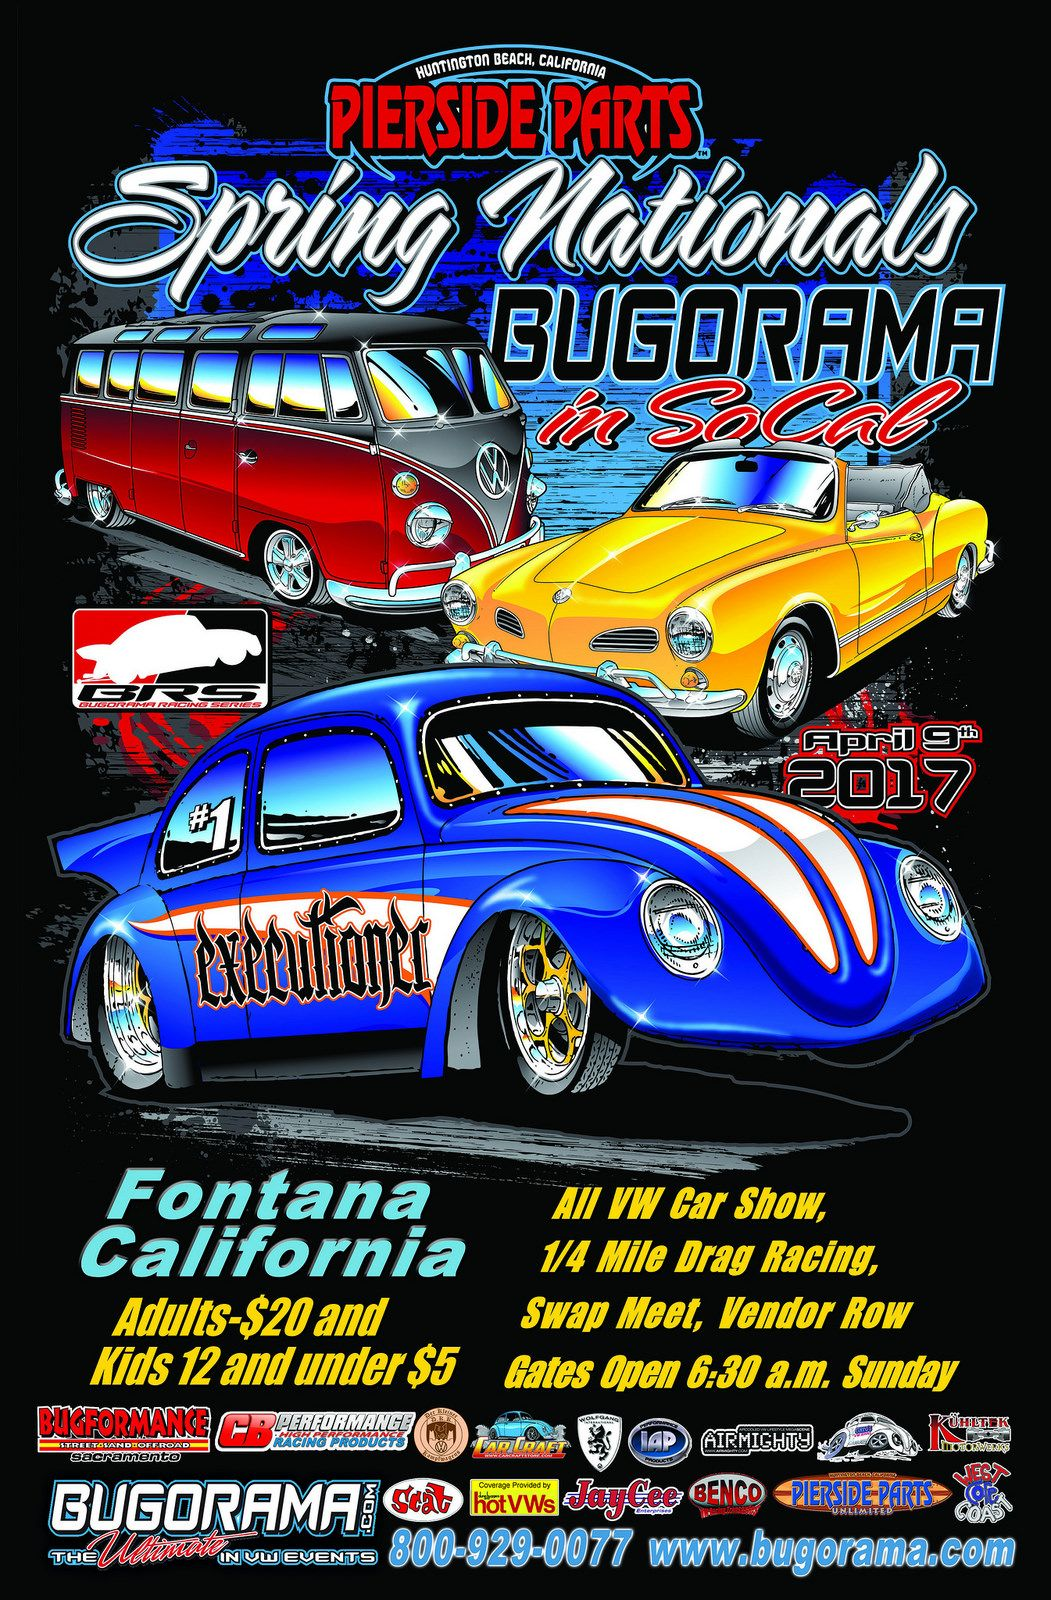 Spring Nationals Bugorama In So Cal April Th Fontana - Sacramento car show and swap meet